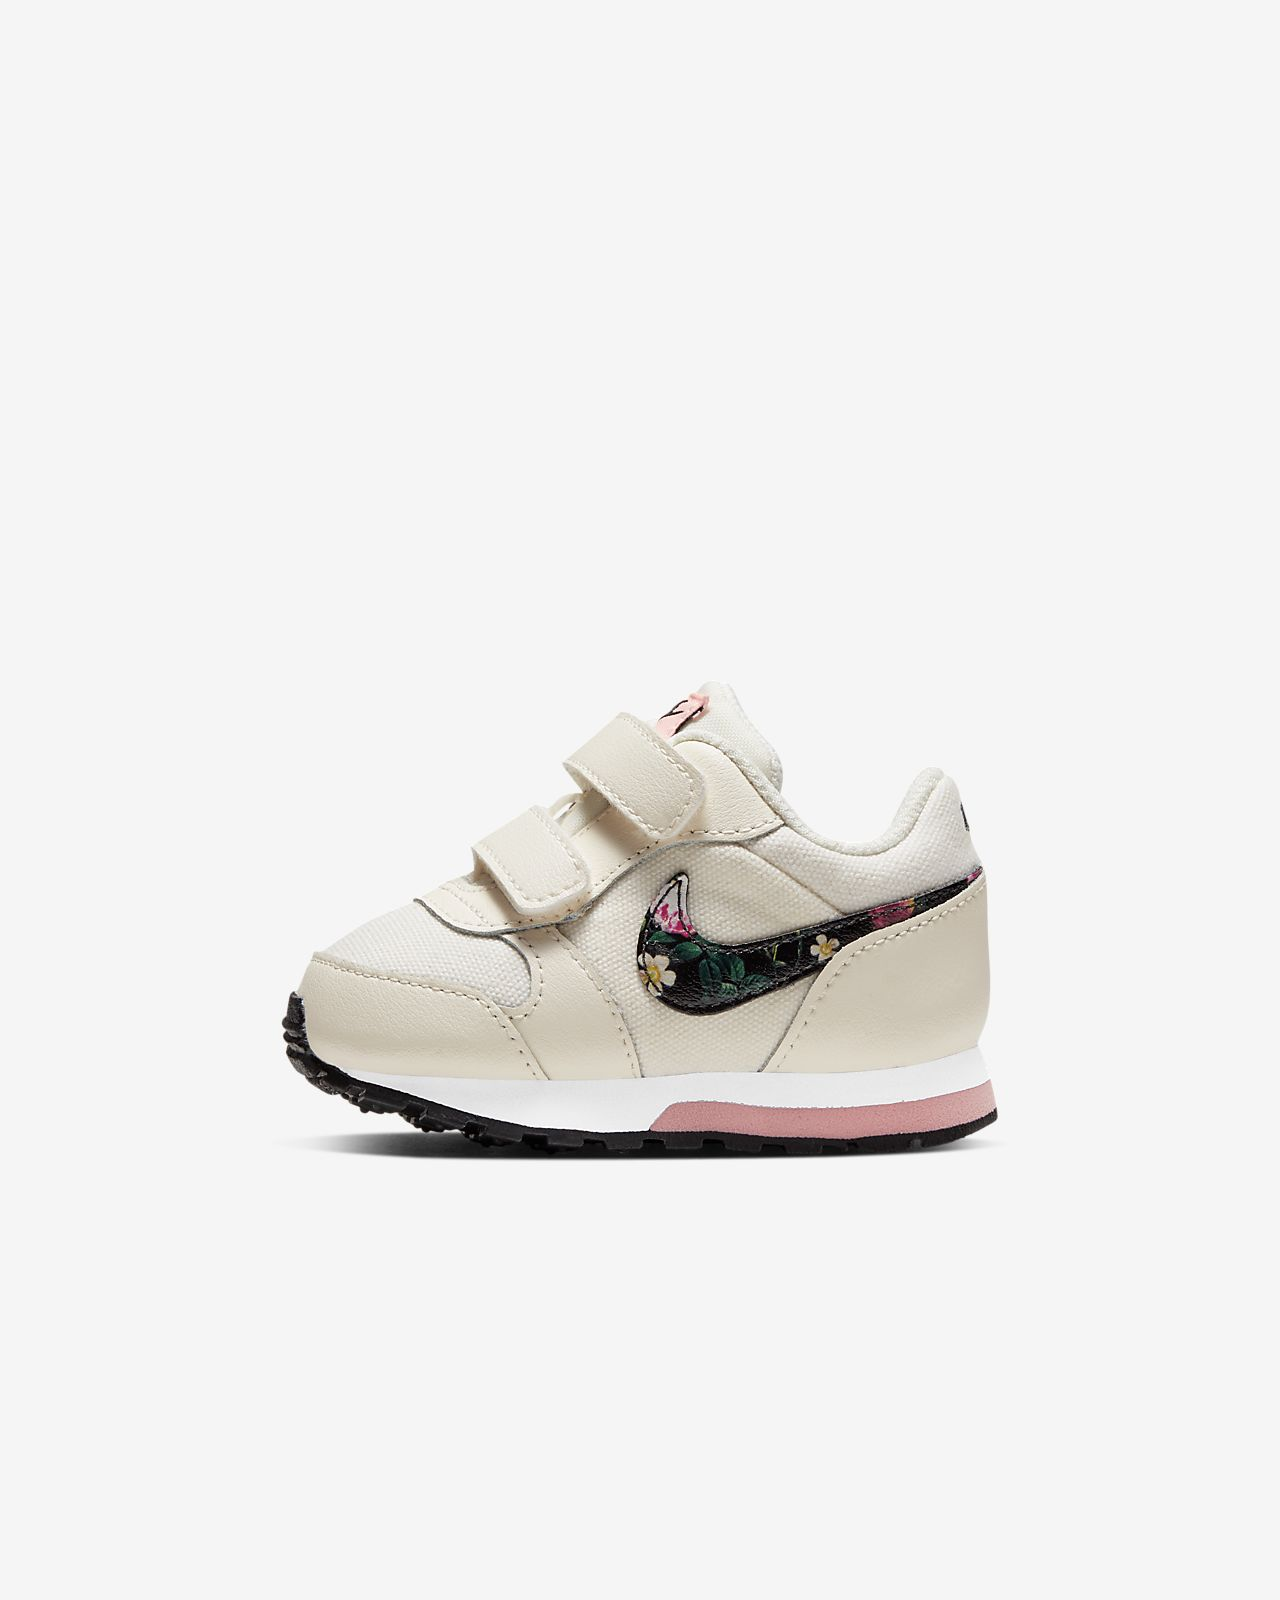 Buty dla niemowląt / maluchów Nike MD Runner 2 Vintage Floral